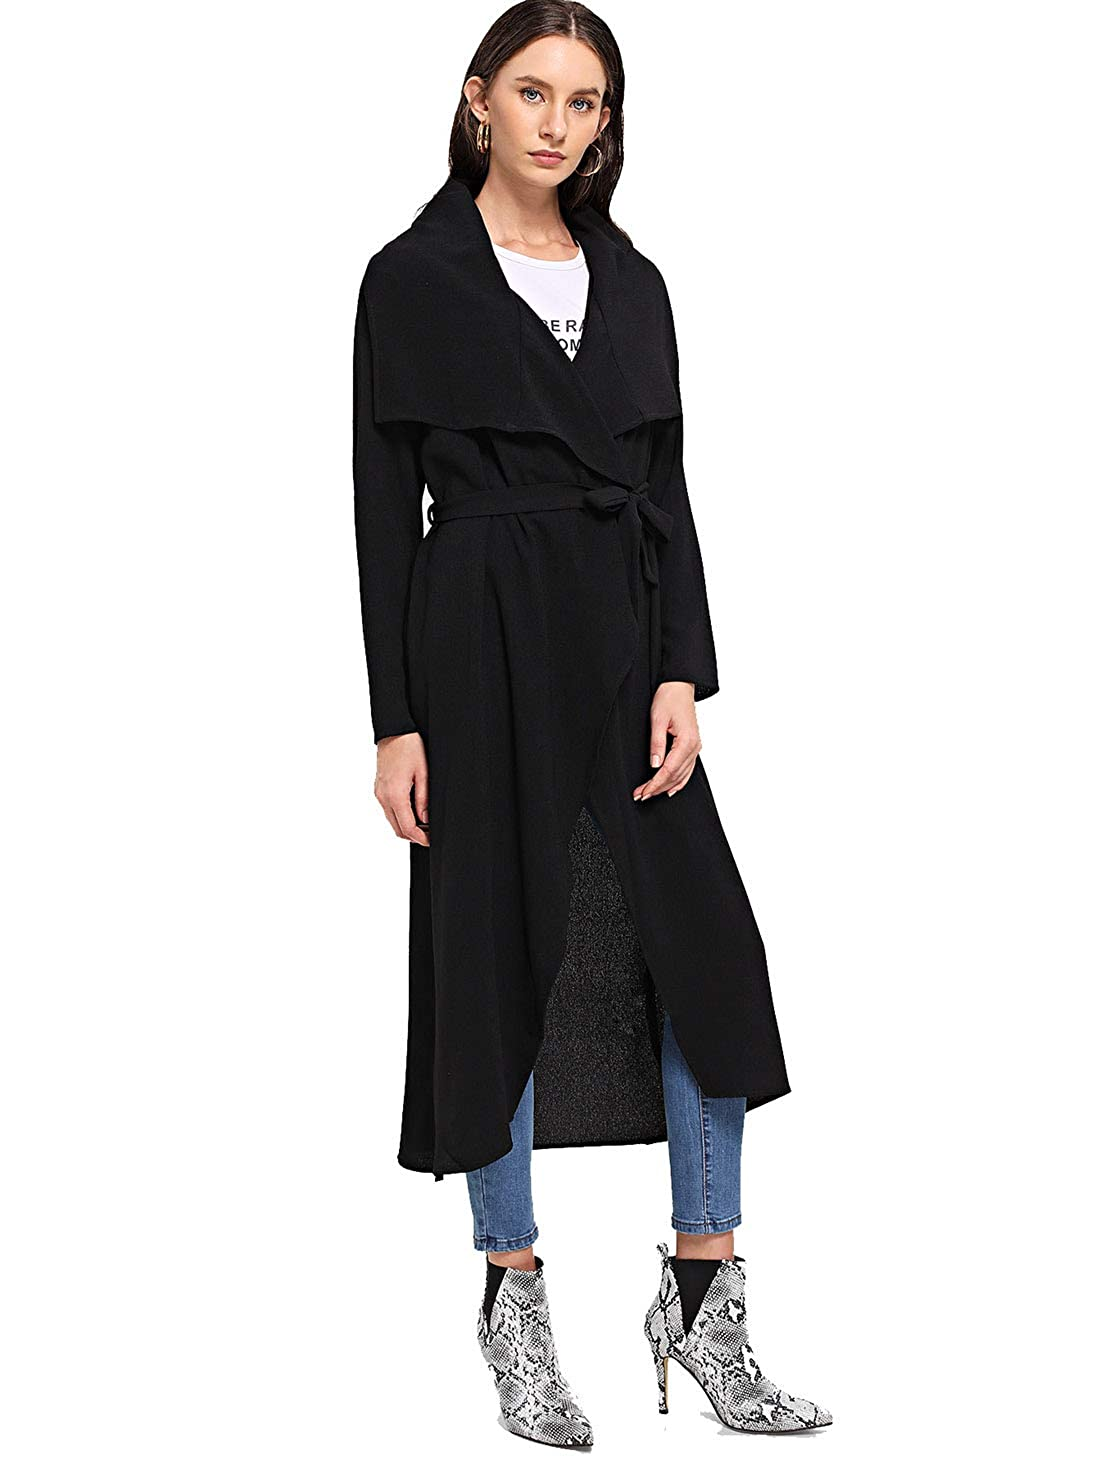 Romwe Womens Casual Long Sleeve Lapel Collar Waterfall Trench Coat Cardigan Outwear